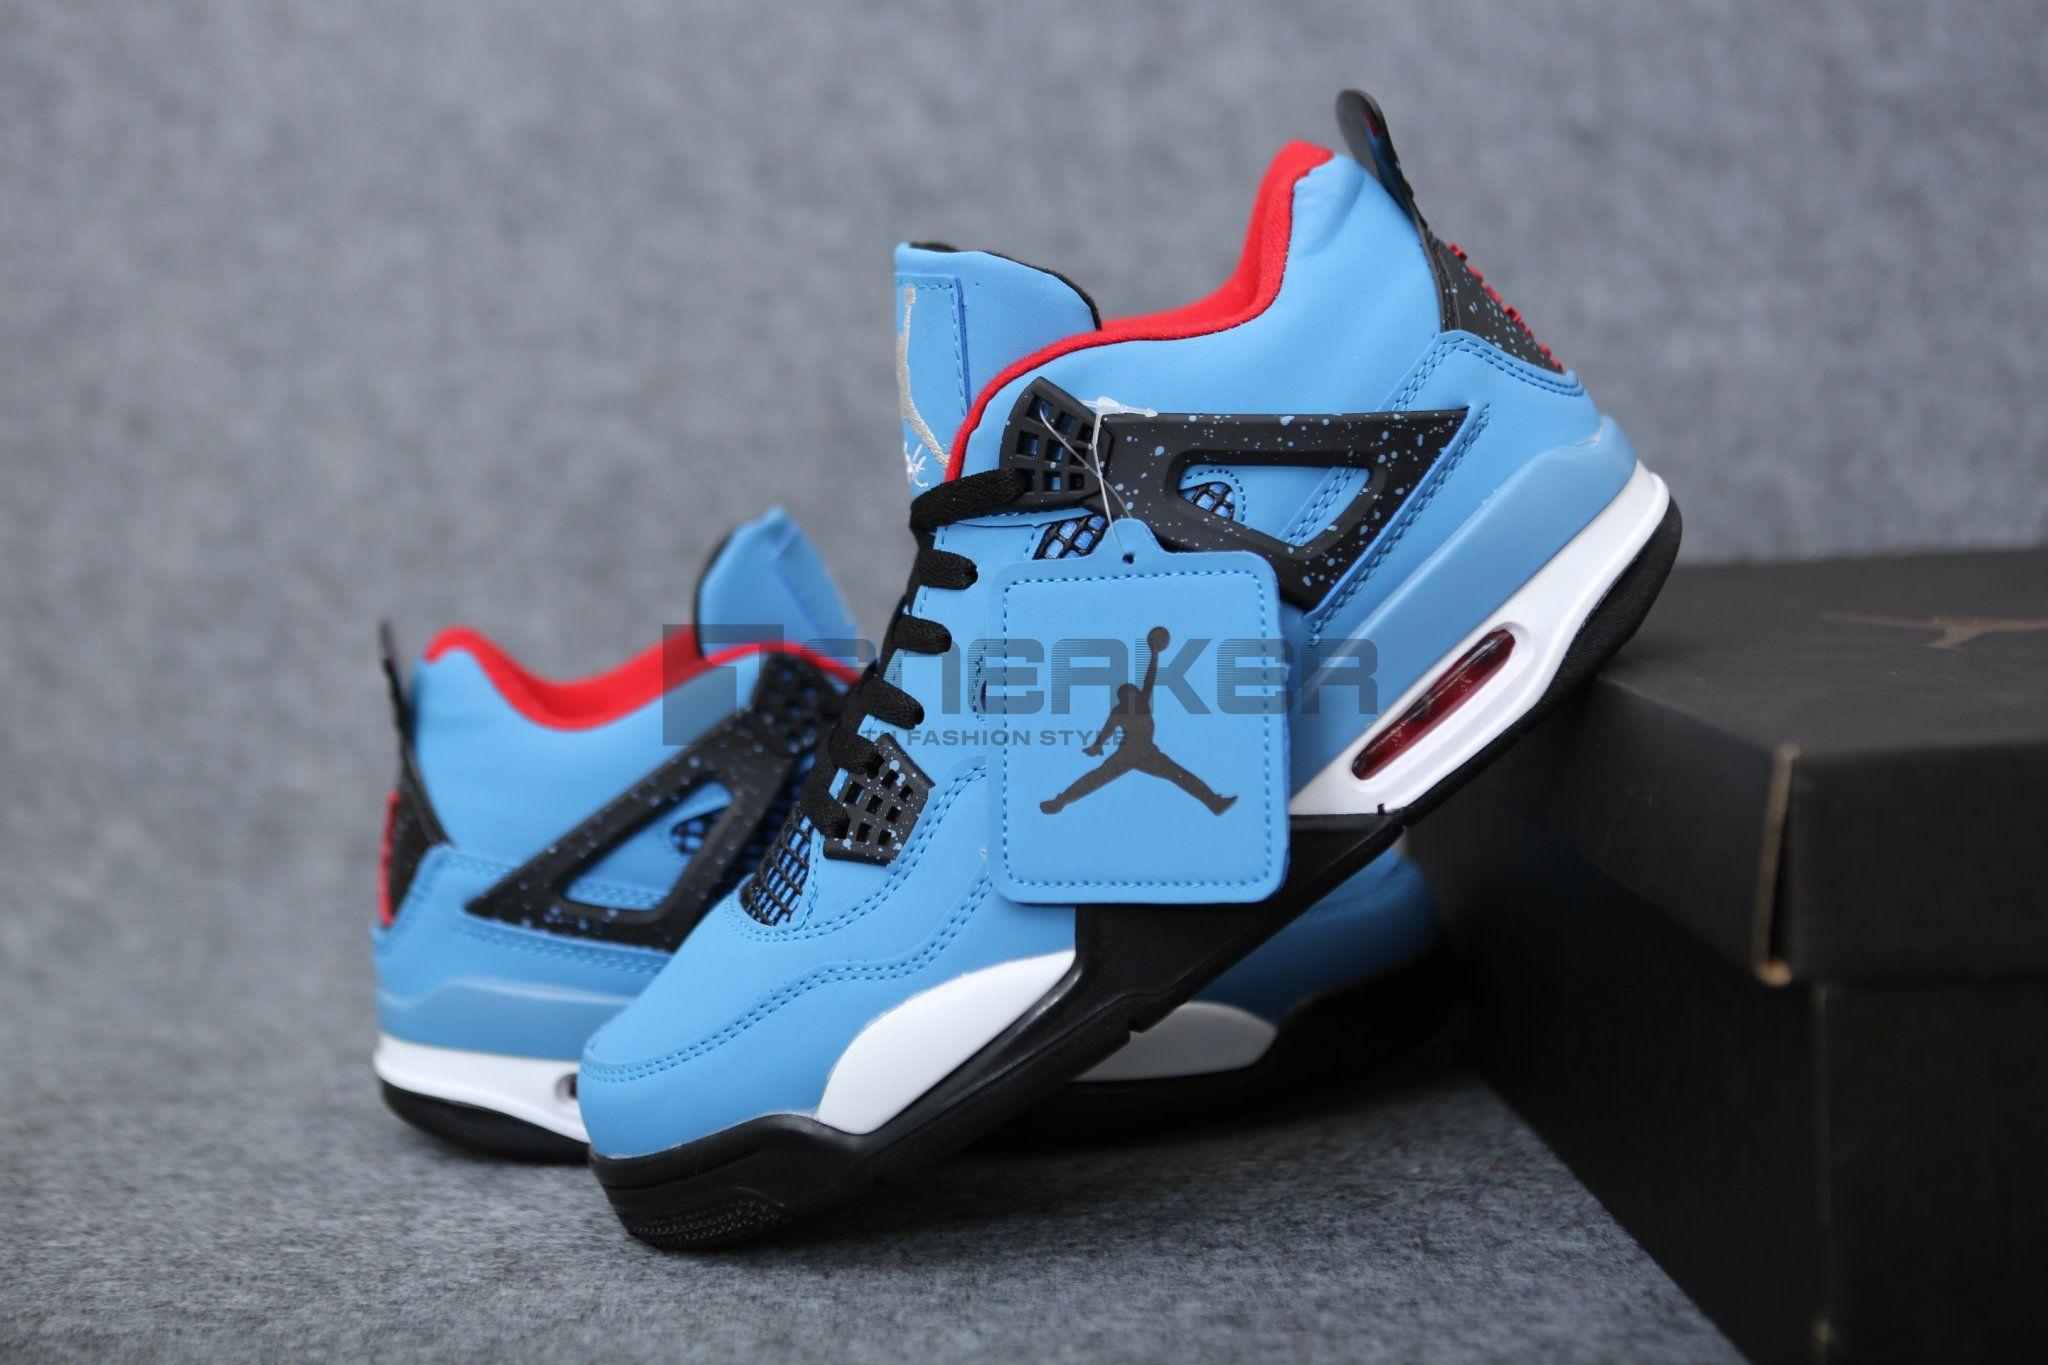 Giay Nike Air Jordan 4 Travis Scott Pk God Factory 4